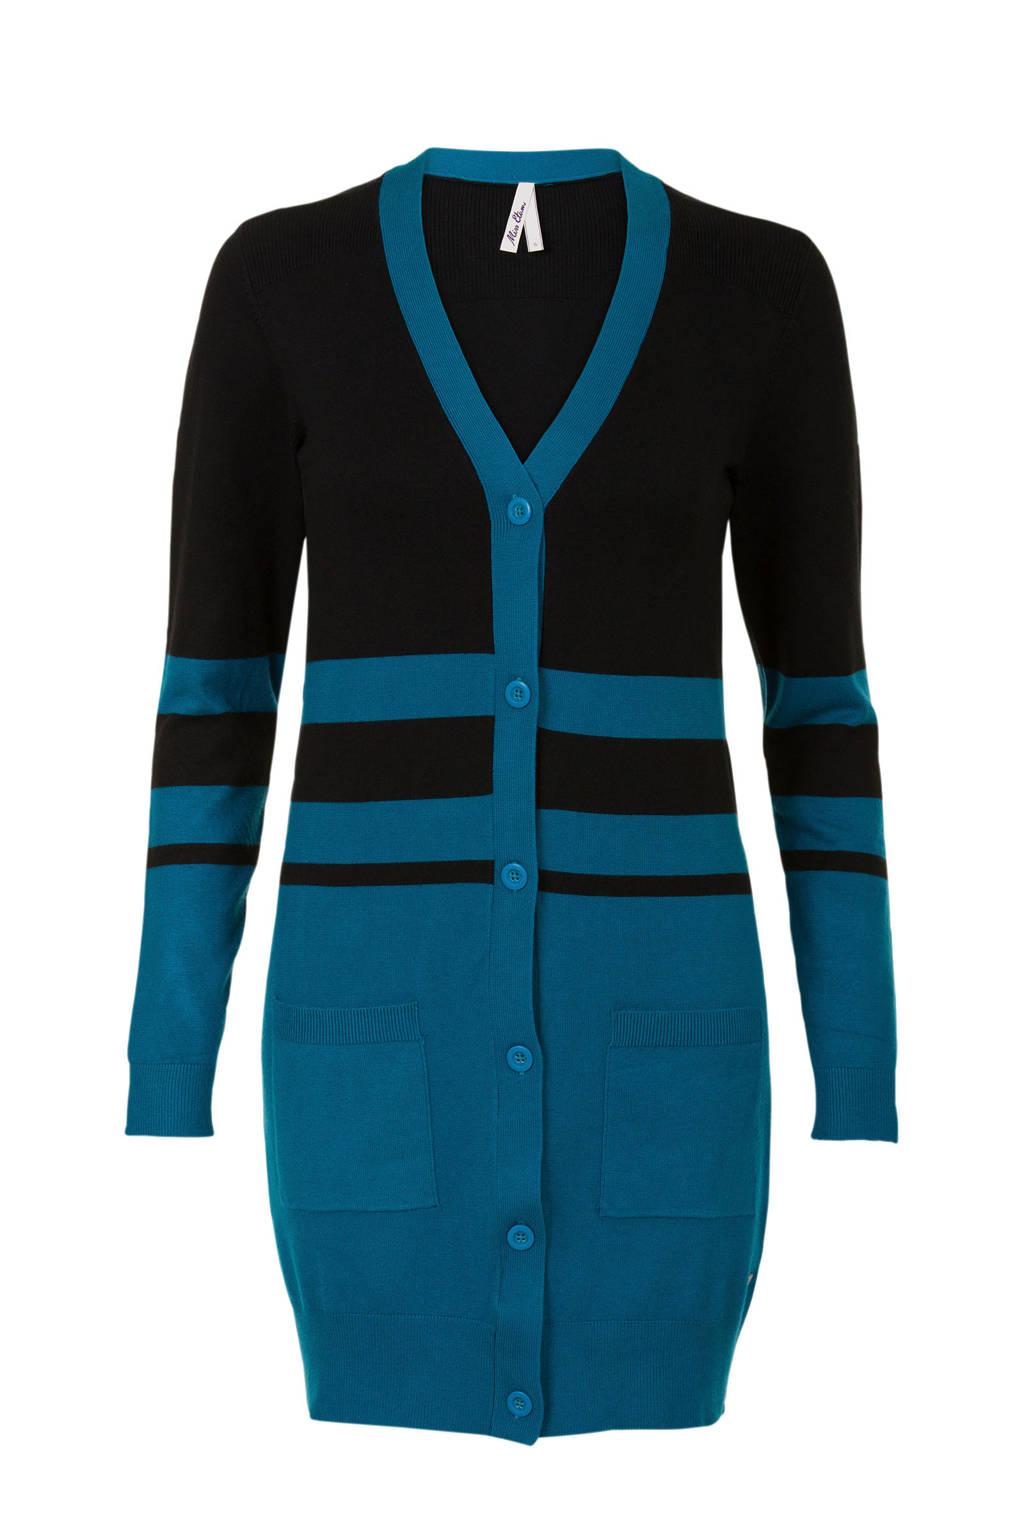 Miss Etam Regulier tweekleurig vest blauw, Blauw/zwart